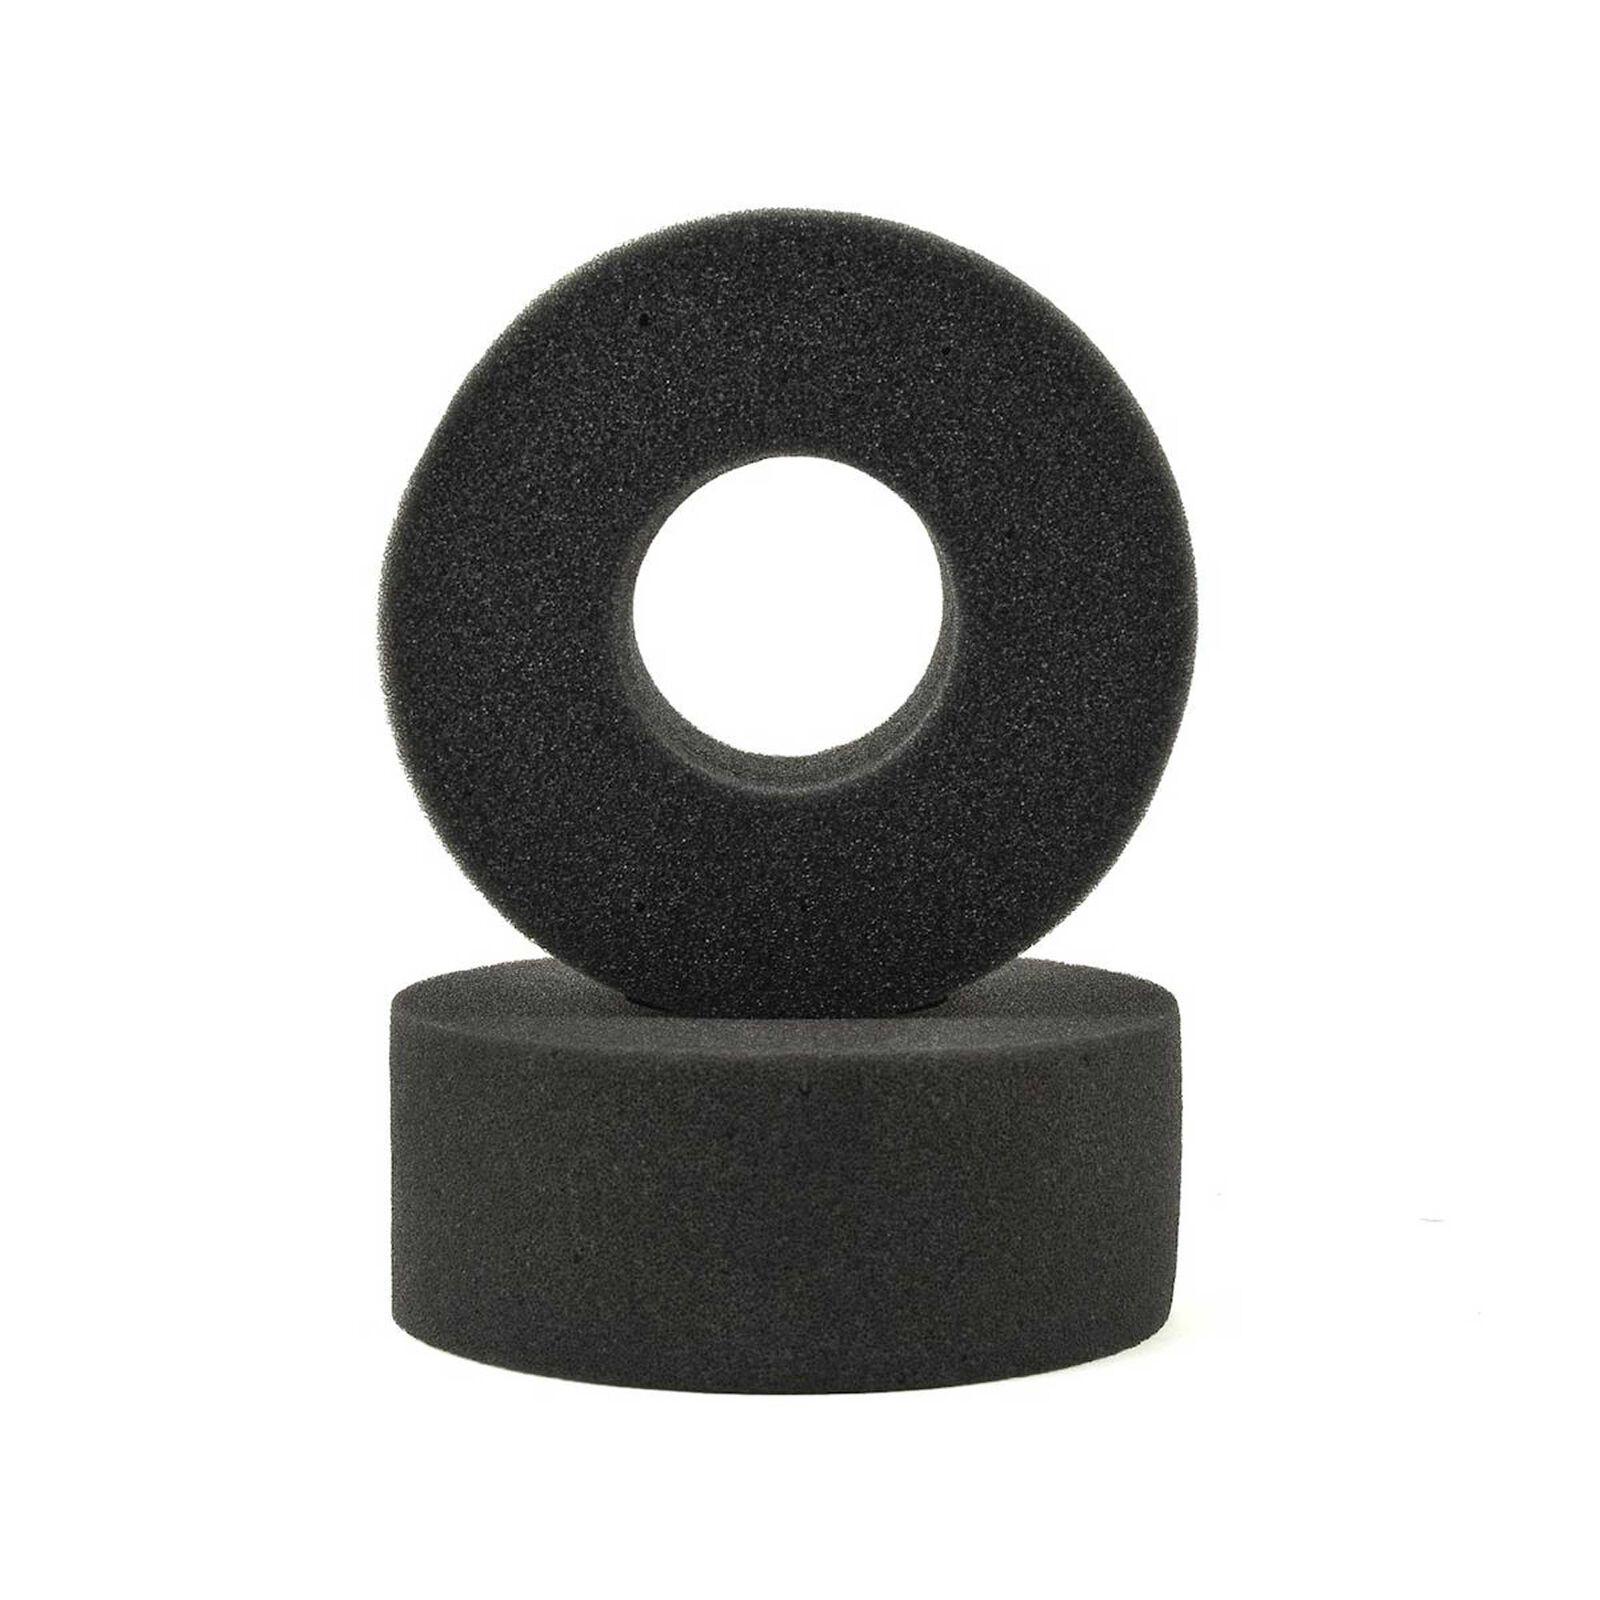 Dirty Richard Single Stage Foam Inserts Firm 115x47.6x40 (2)